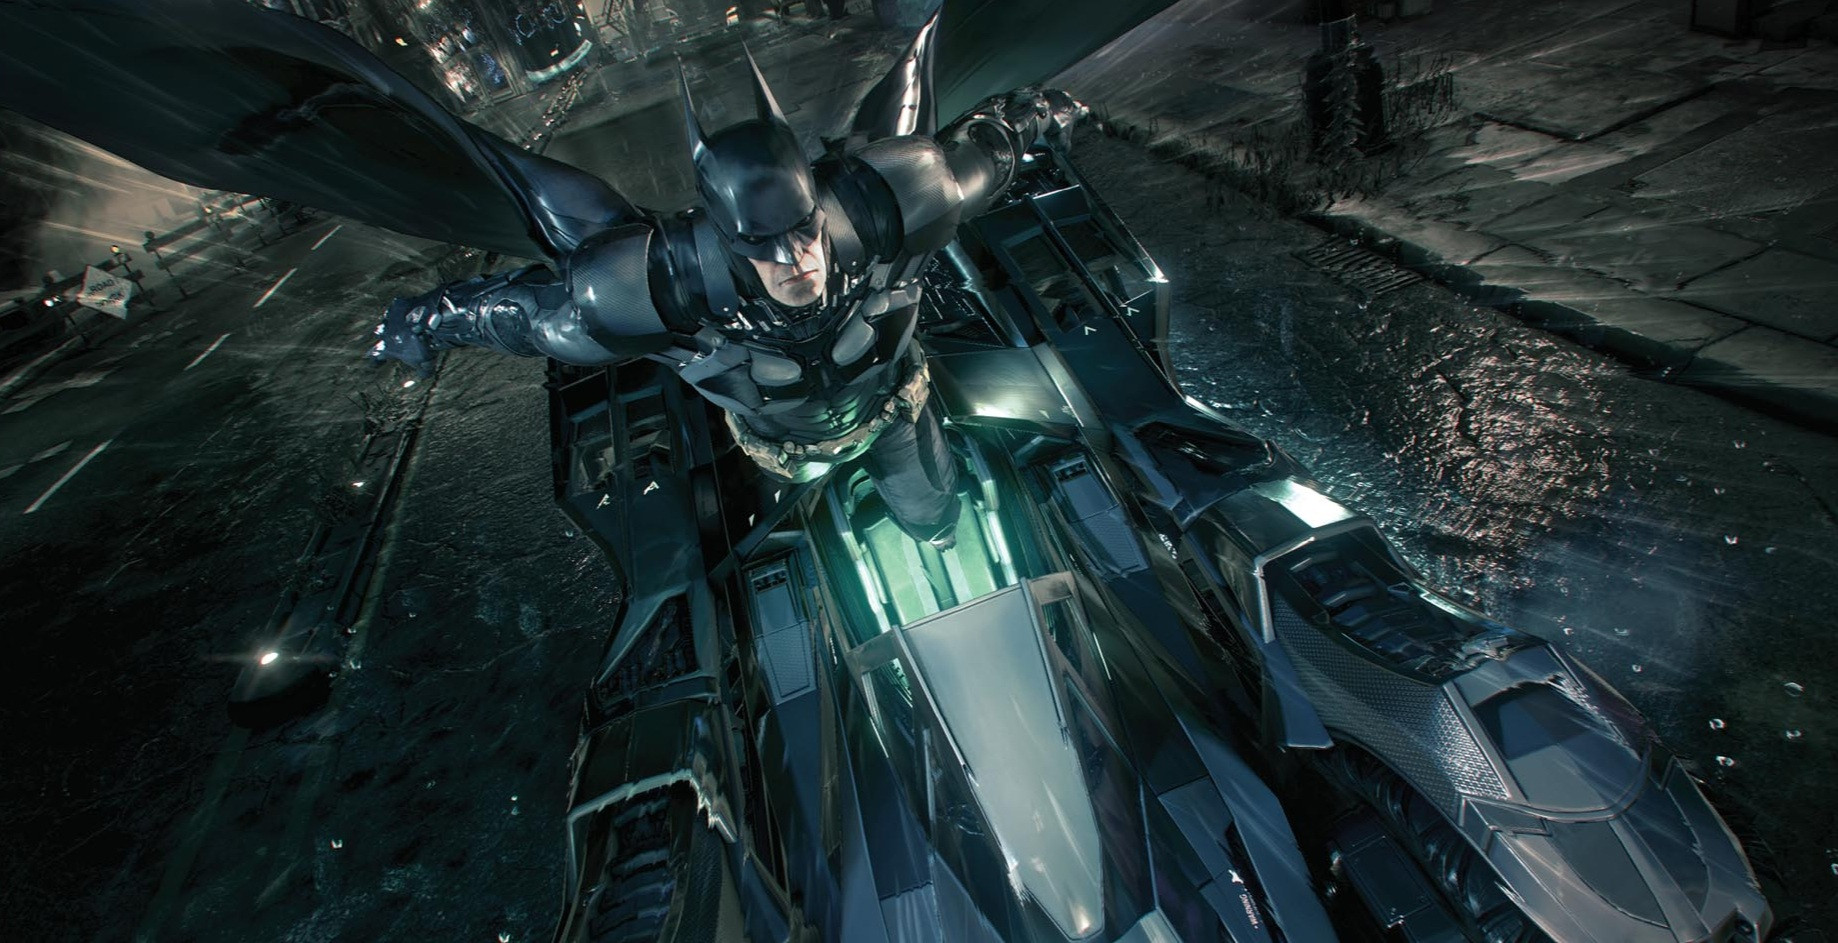 batman-arkham-knight-sc4